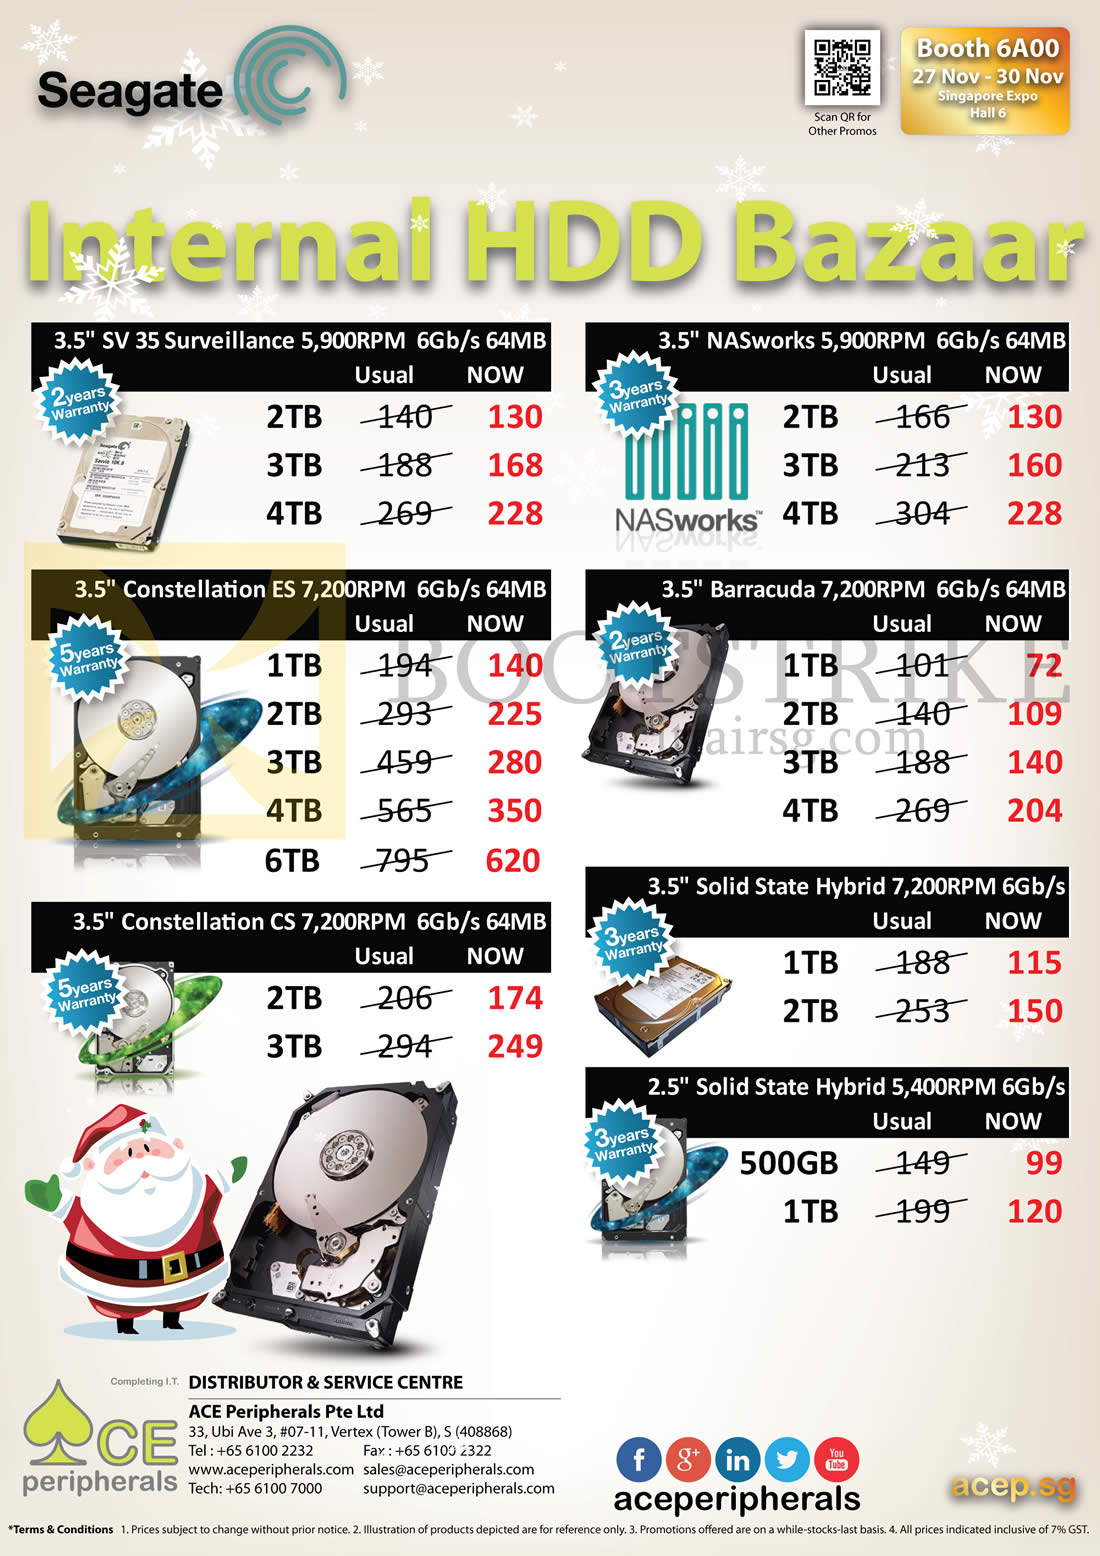 SITEX 2014 price list image brochure of Ace Peripherals Internal HDDs Seagate Barracuda NASworks SSD Constellation 1TB, 2TB, 3TB, 4TB, 5TB, 6TB